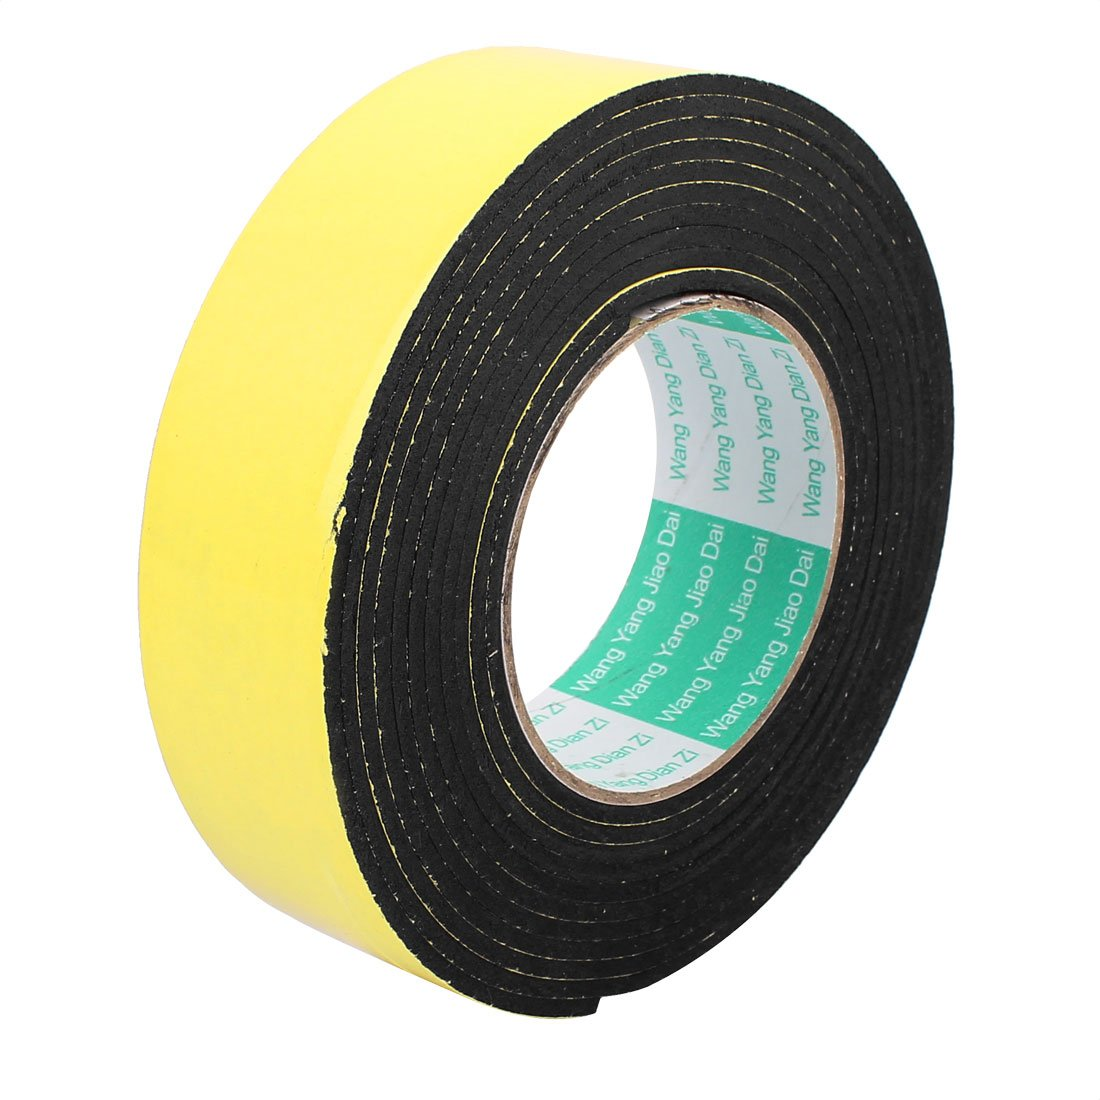 Calidad gummilitze 4 mm x 5 M de goma cinta elástica schlüpfergummi 1,20 €//1m